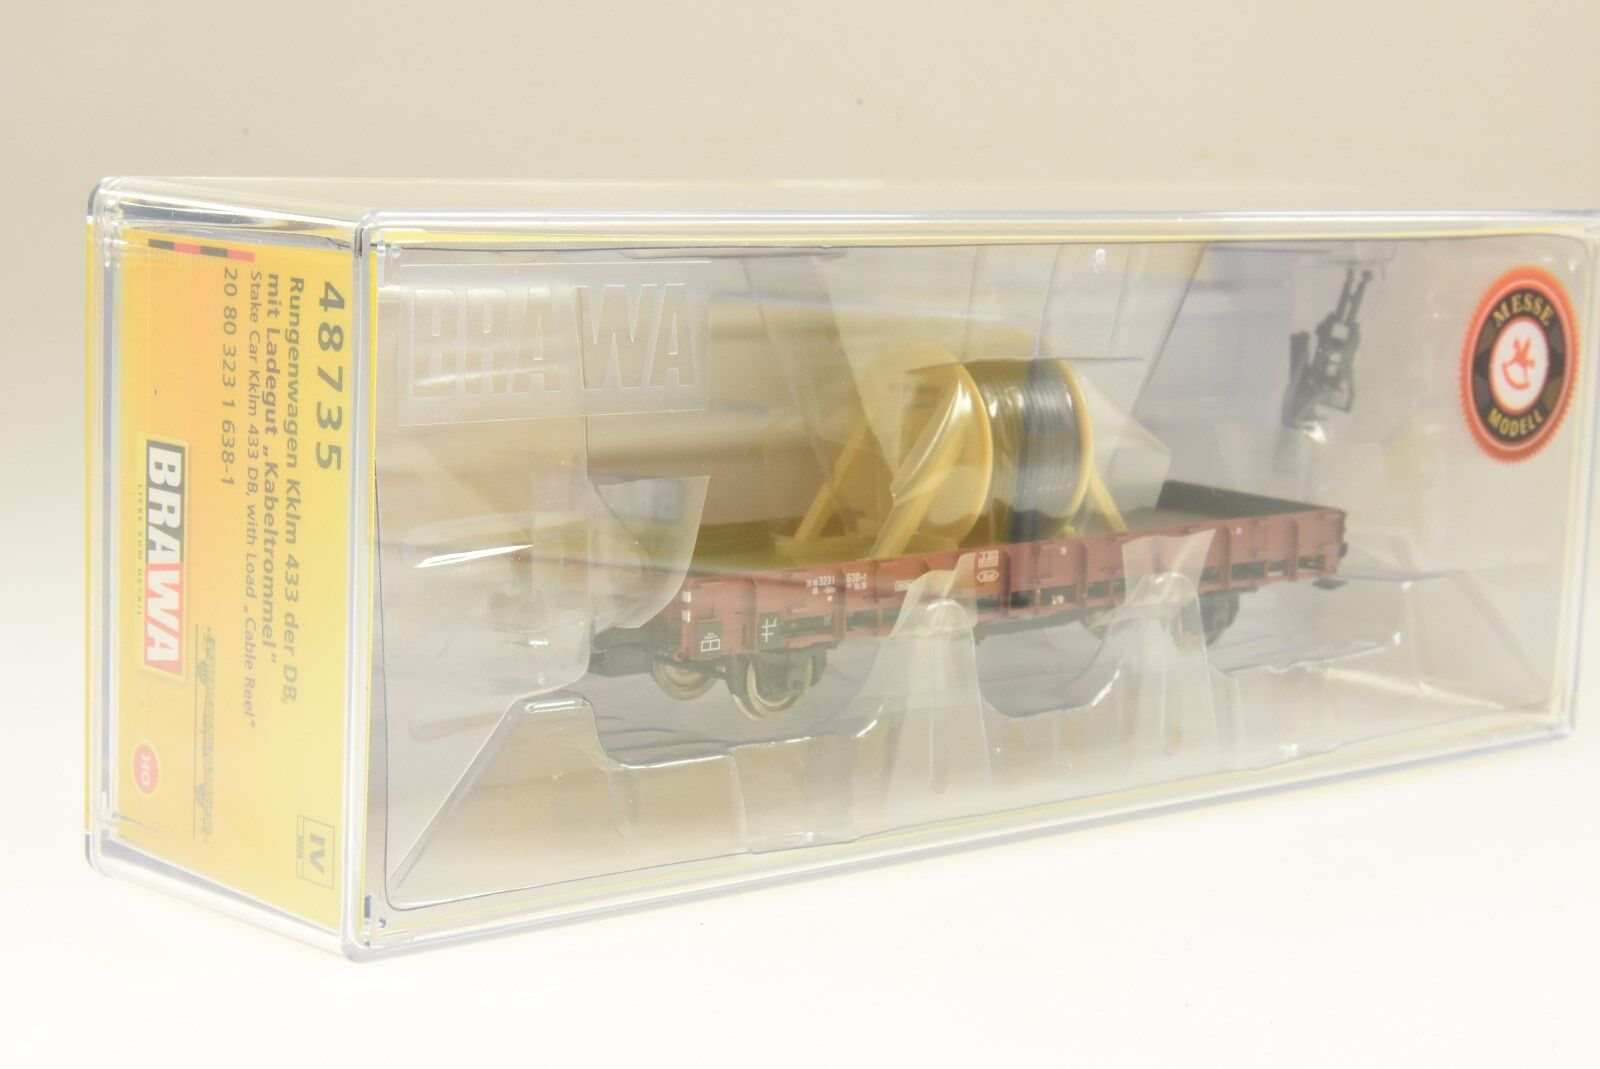 Brawa H0 48626 offener Güterwagen E-52 Omm Ladegut Seilbahngondel DB NEU und OVP  | Outlet Online Store